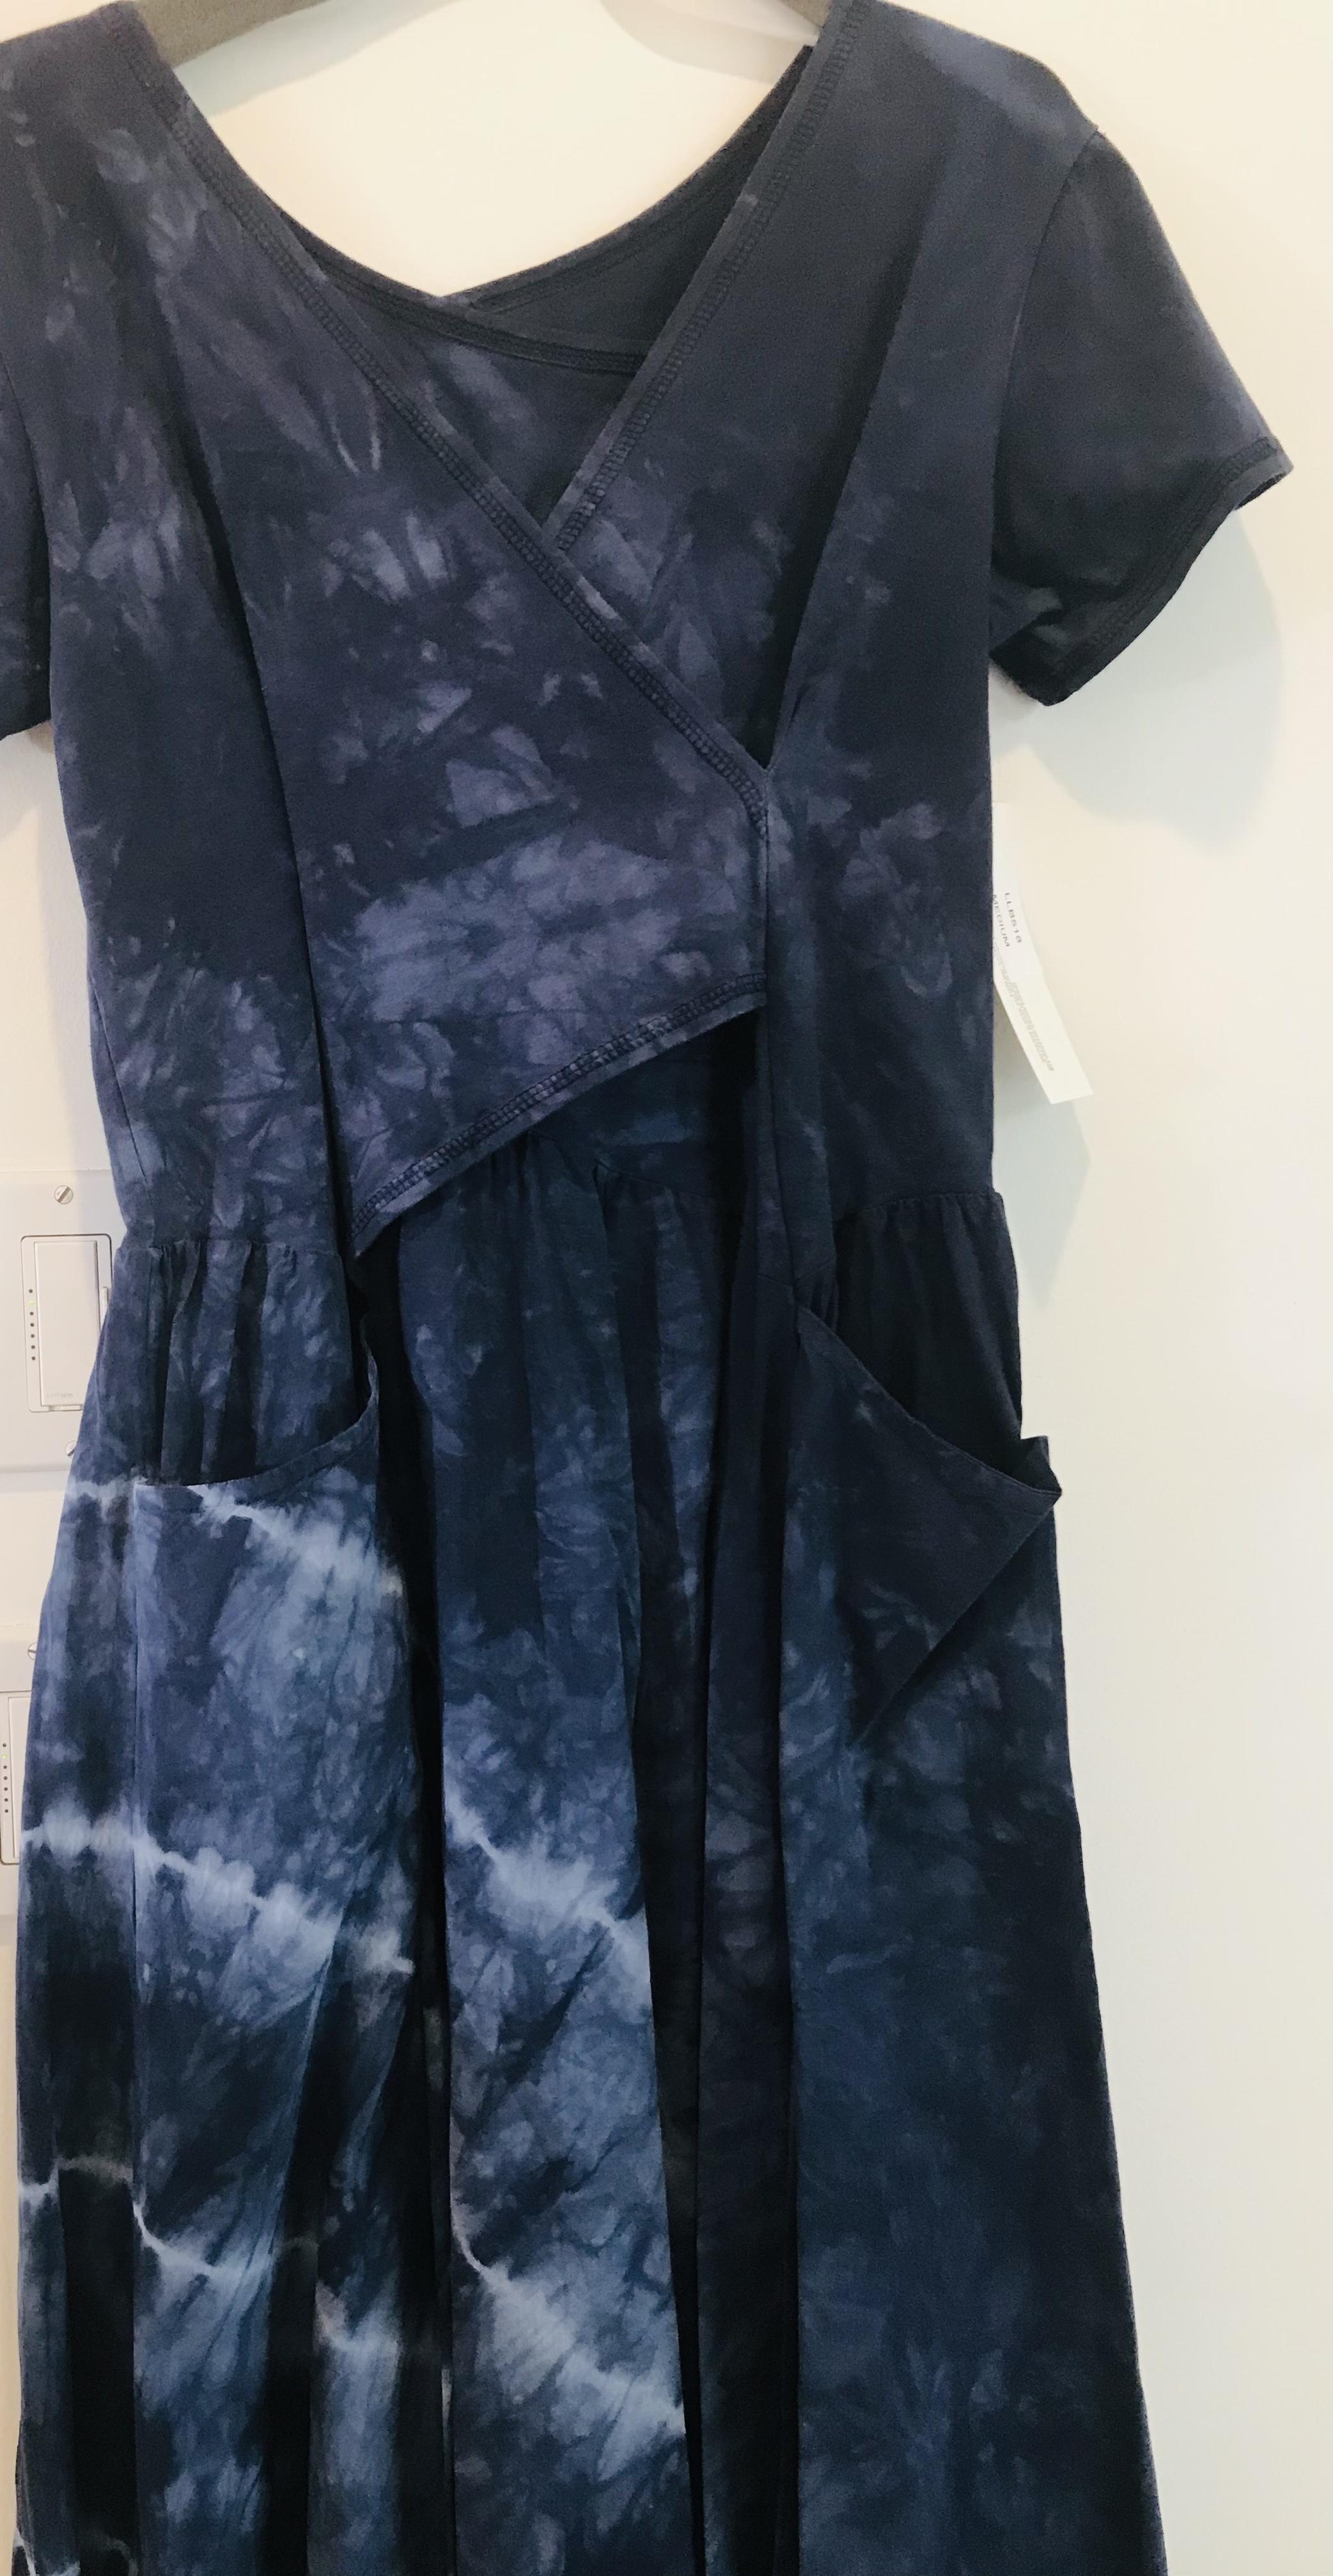 Luna Luz: Short Sleeve Cross Over Bodice Tie Dye Long Dress (Ships Immed: Navy Shoreline, 1 Left!)